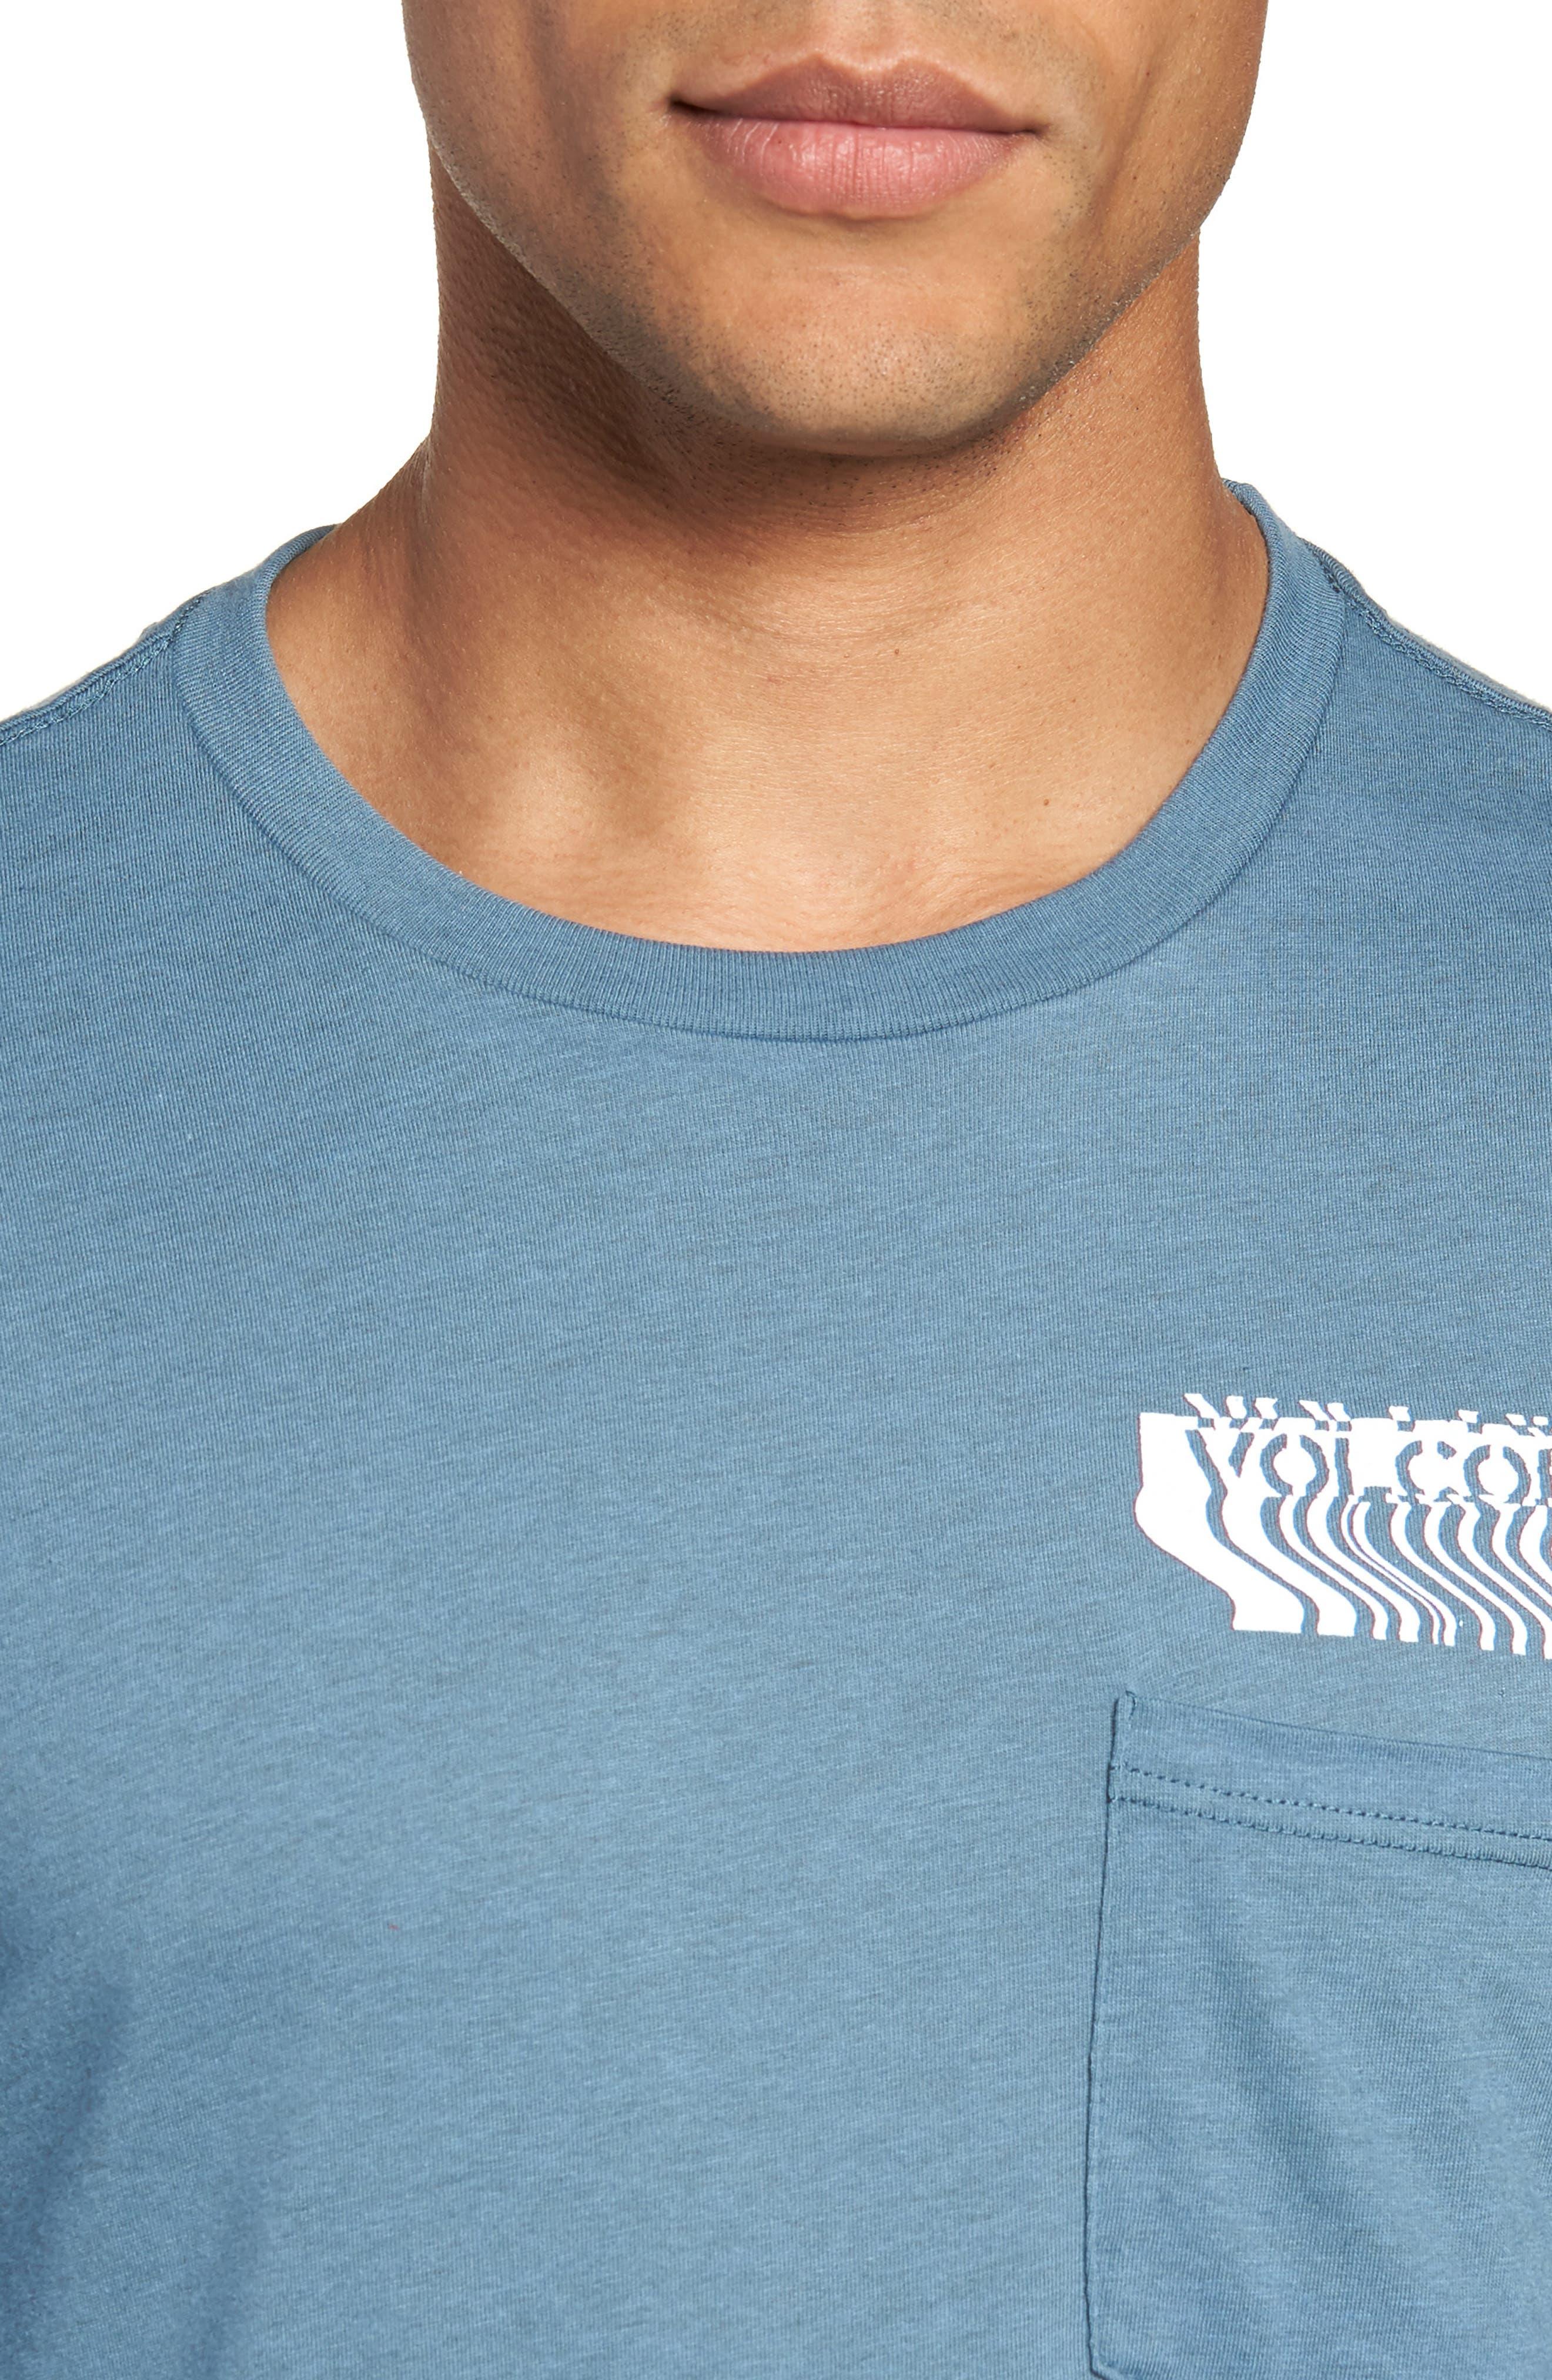 Bard Pocket Cotton Blend T-Shirt,                             Alternate thumbnail 4, color,                             Indigo